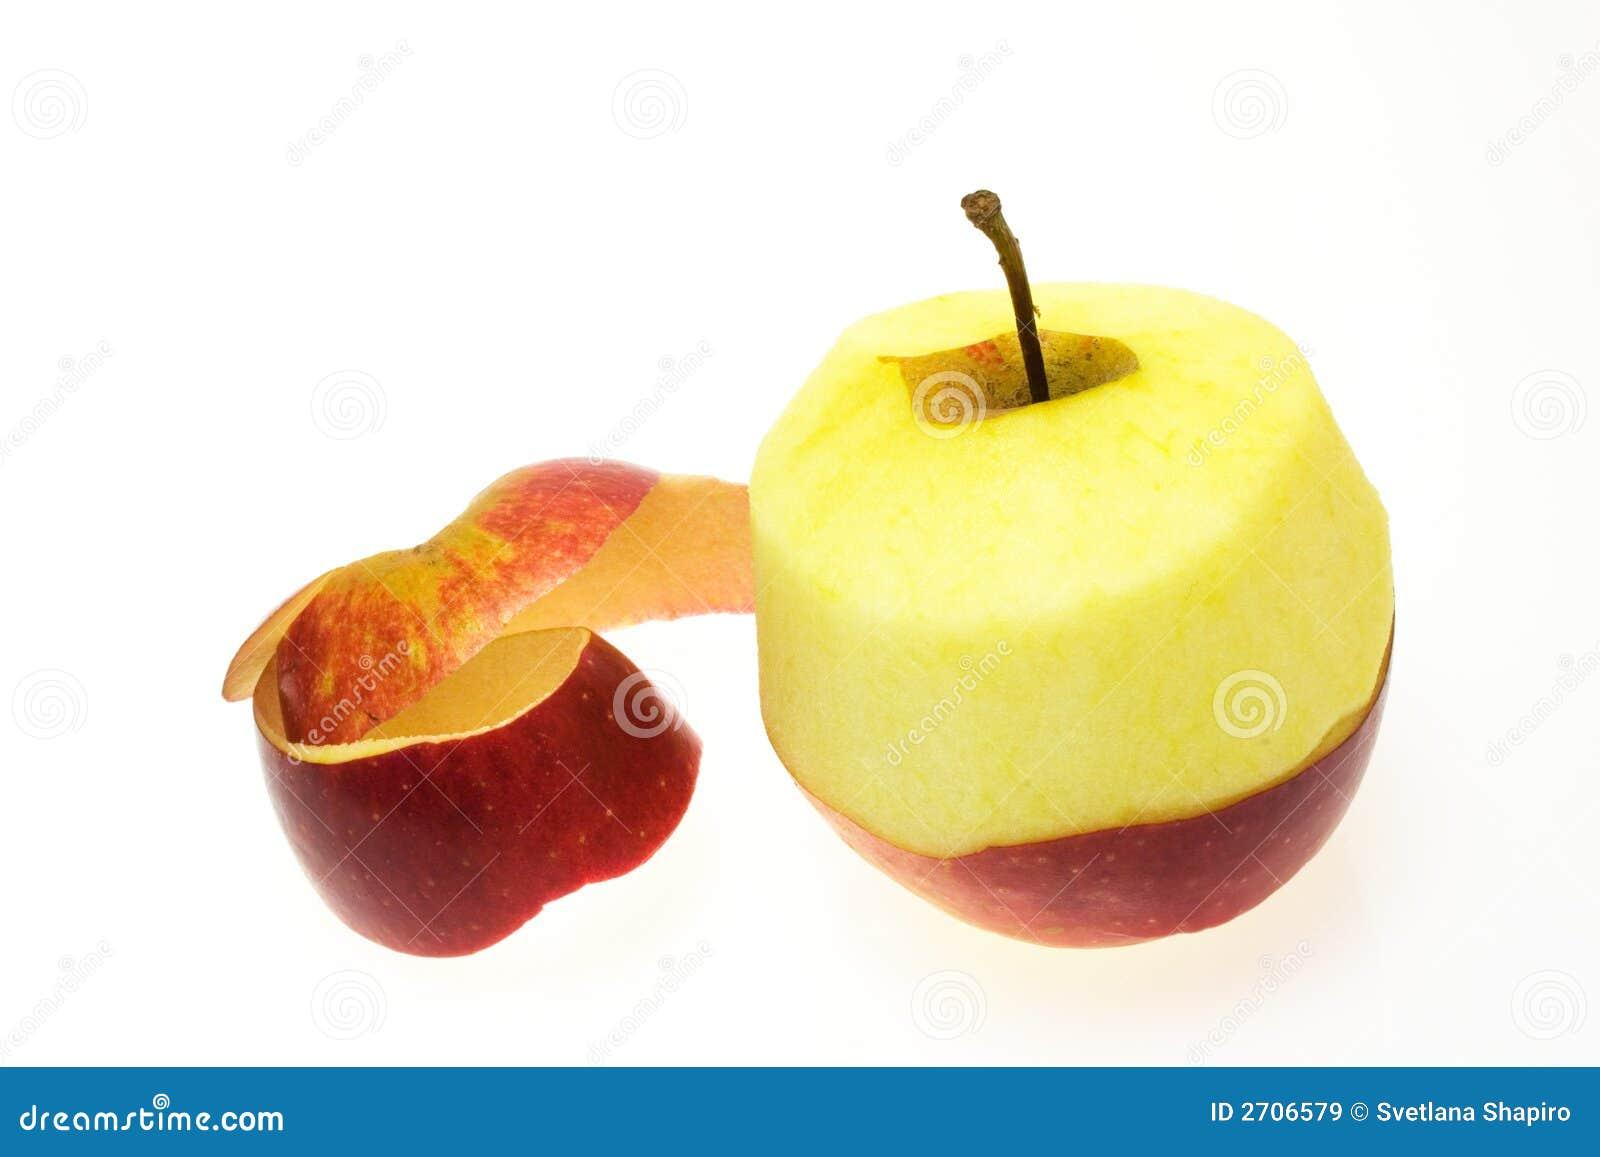 Peeled Apple Royalty Free Stock Images - Image: 2706579